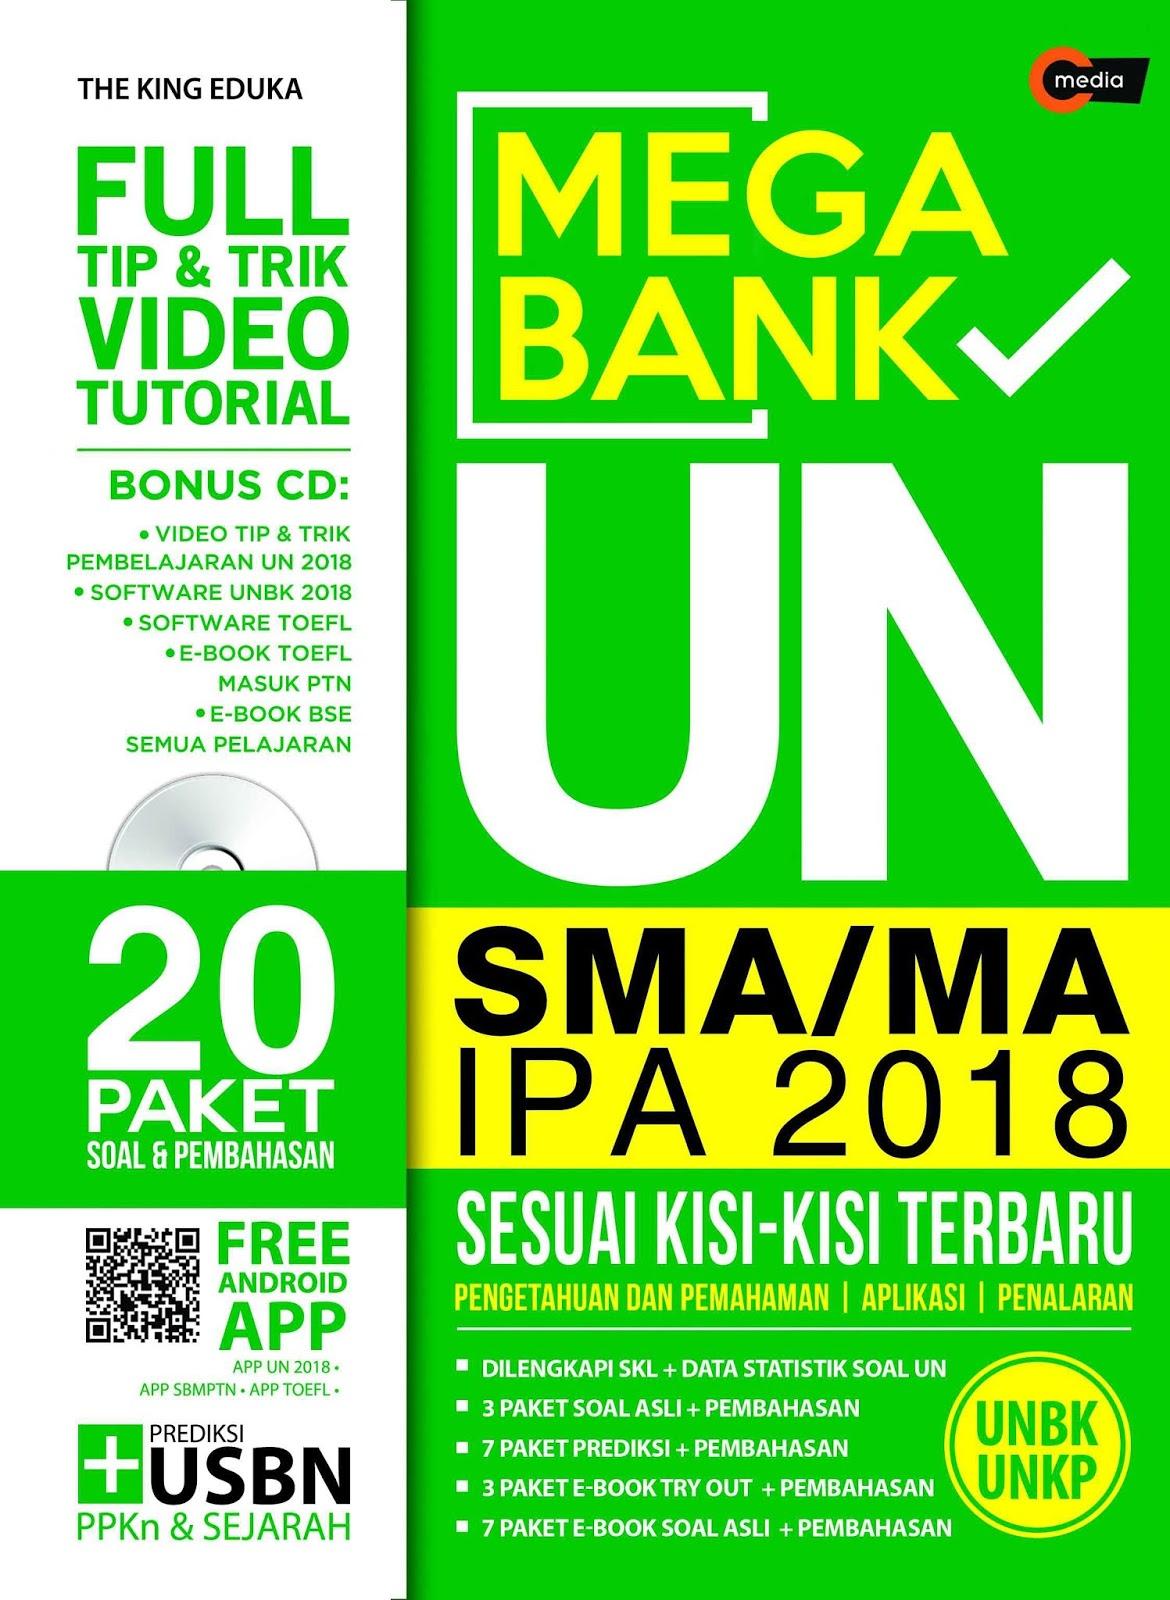 Download Mega Bank UN SMA/MA IPA 2018 (Sesuai Kisi-Kisi Terbaru)